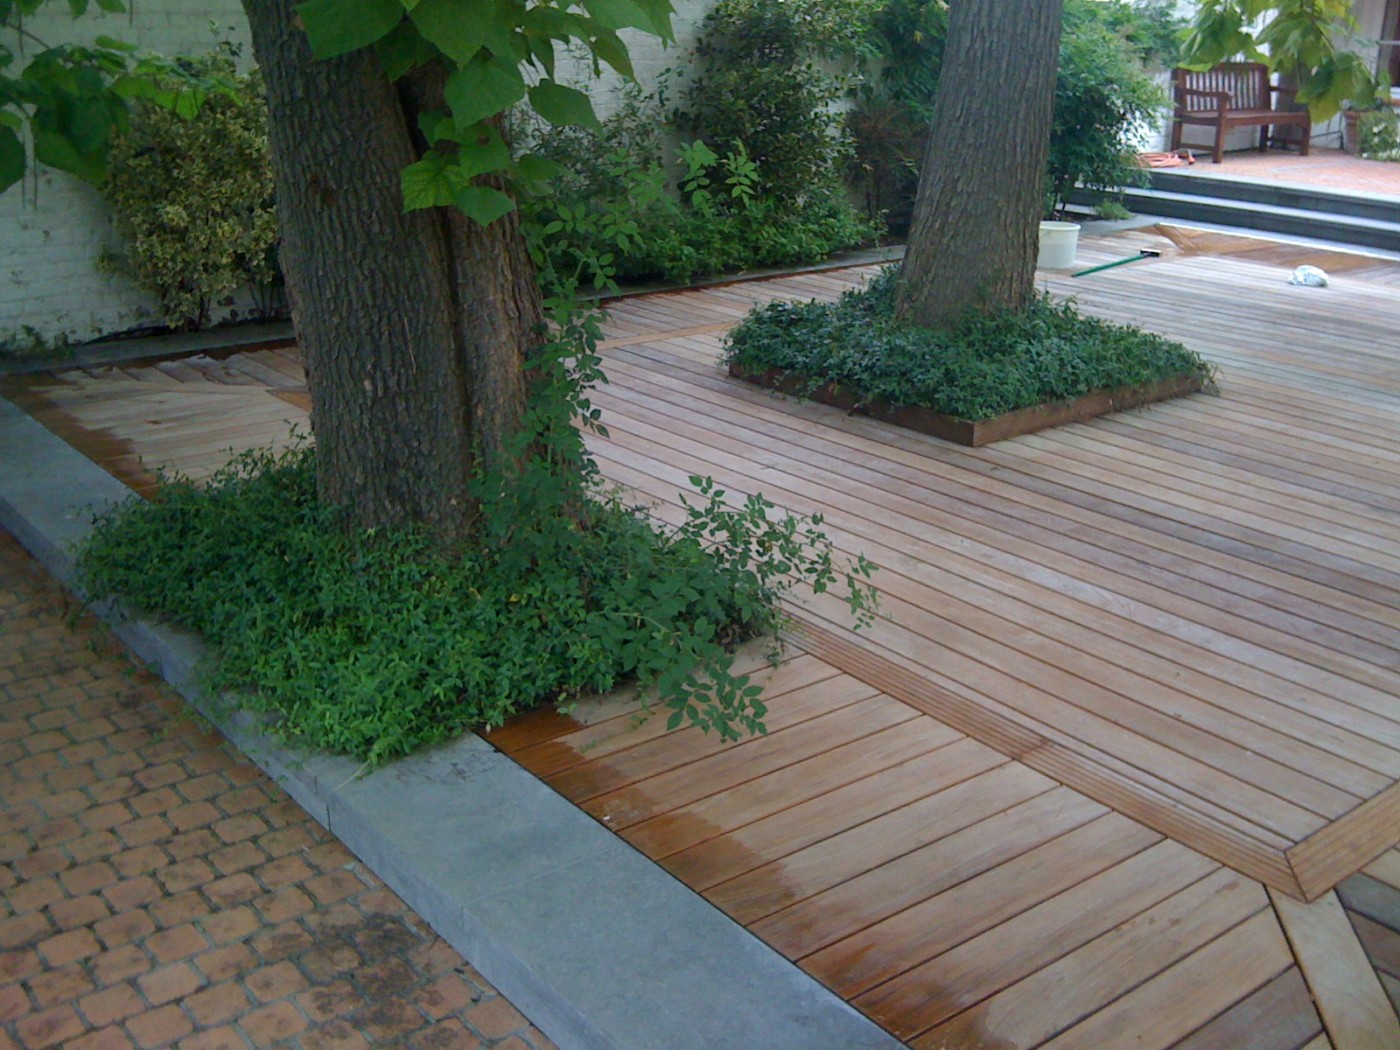 Entretien Terrasse Bois Entretien Terrasse Bois Arbre Pierre Mt Design